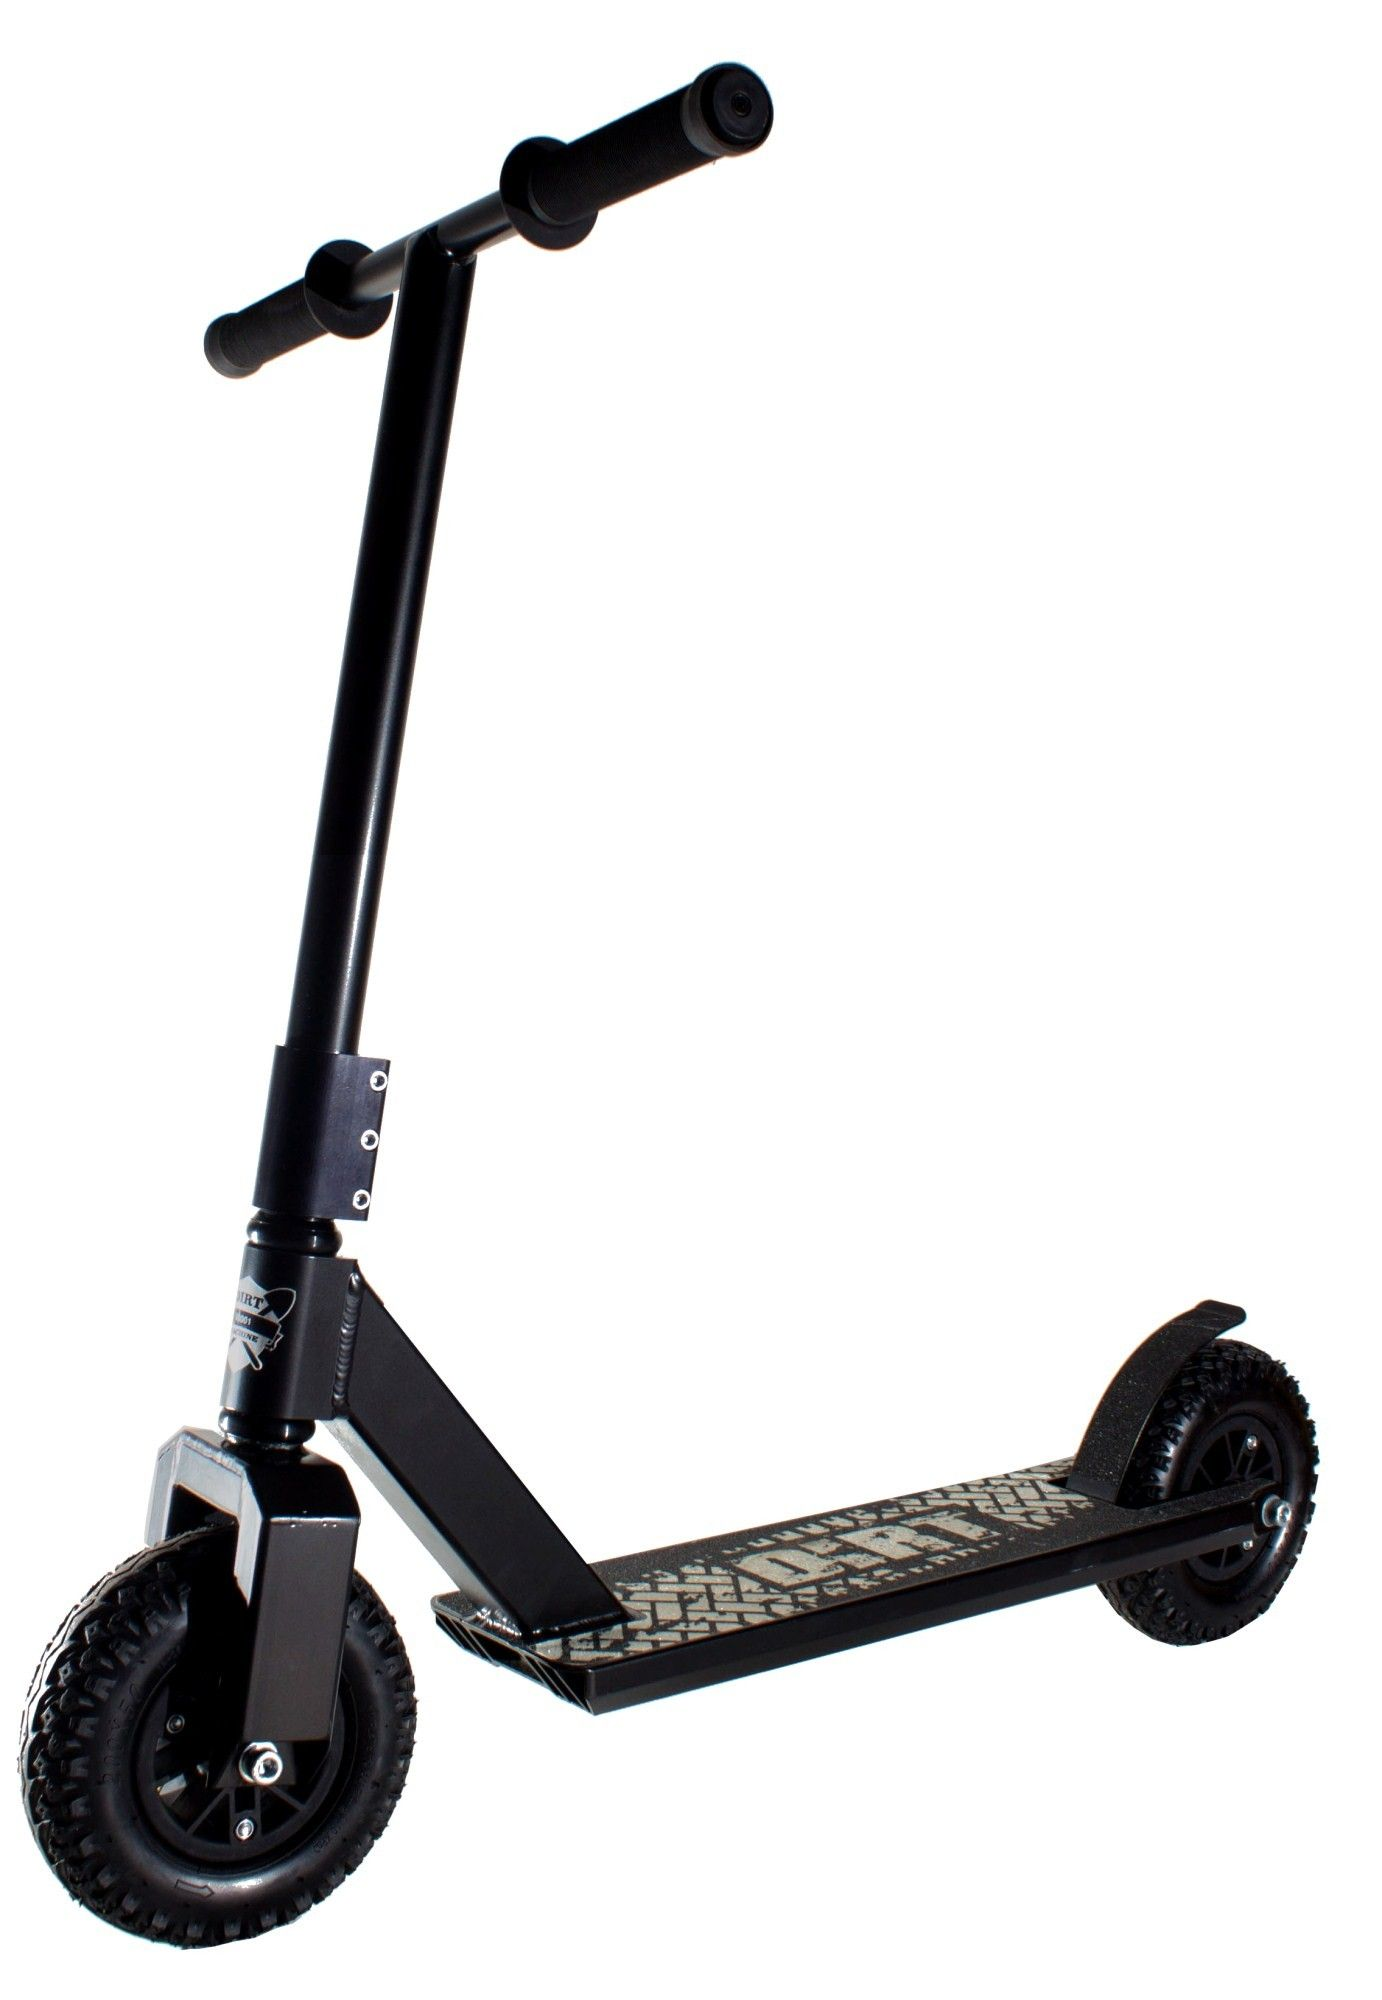 Dirt Scooter G1 Black Monopatin Patineta Vehiculos